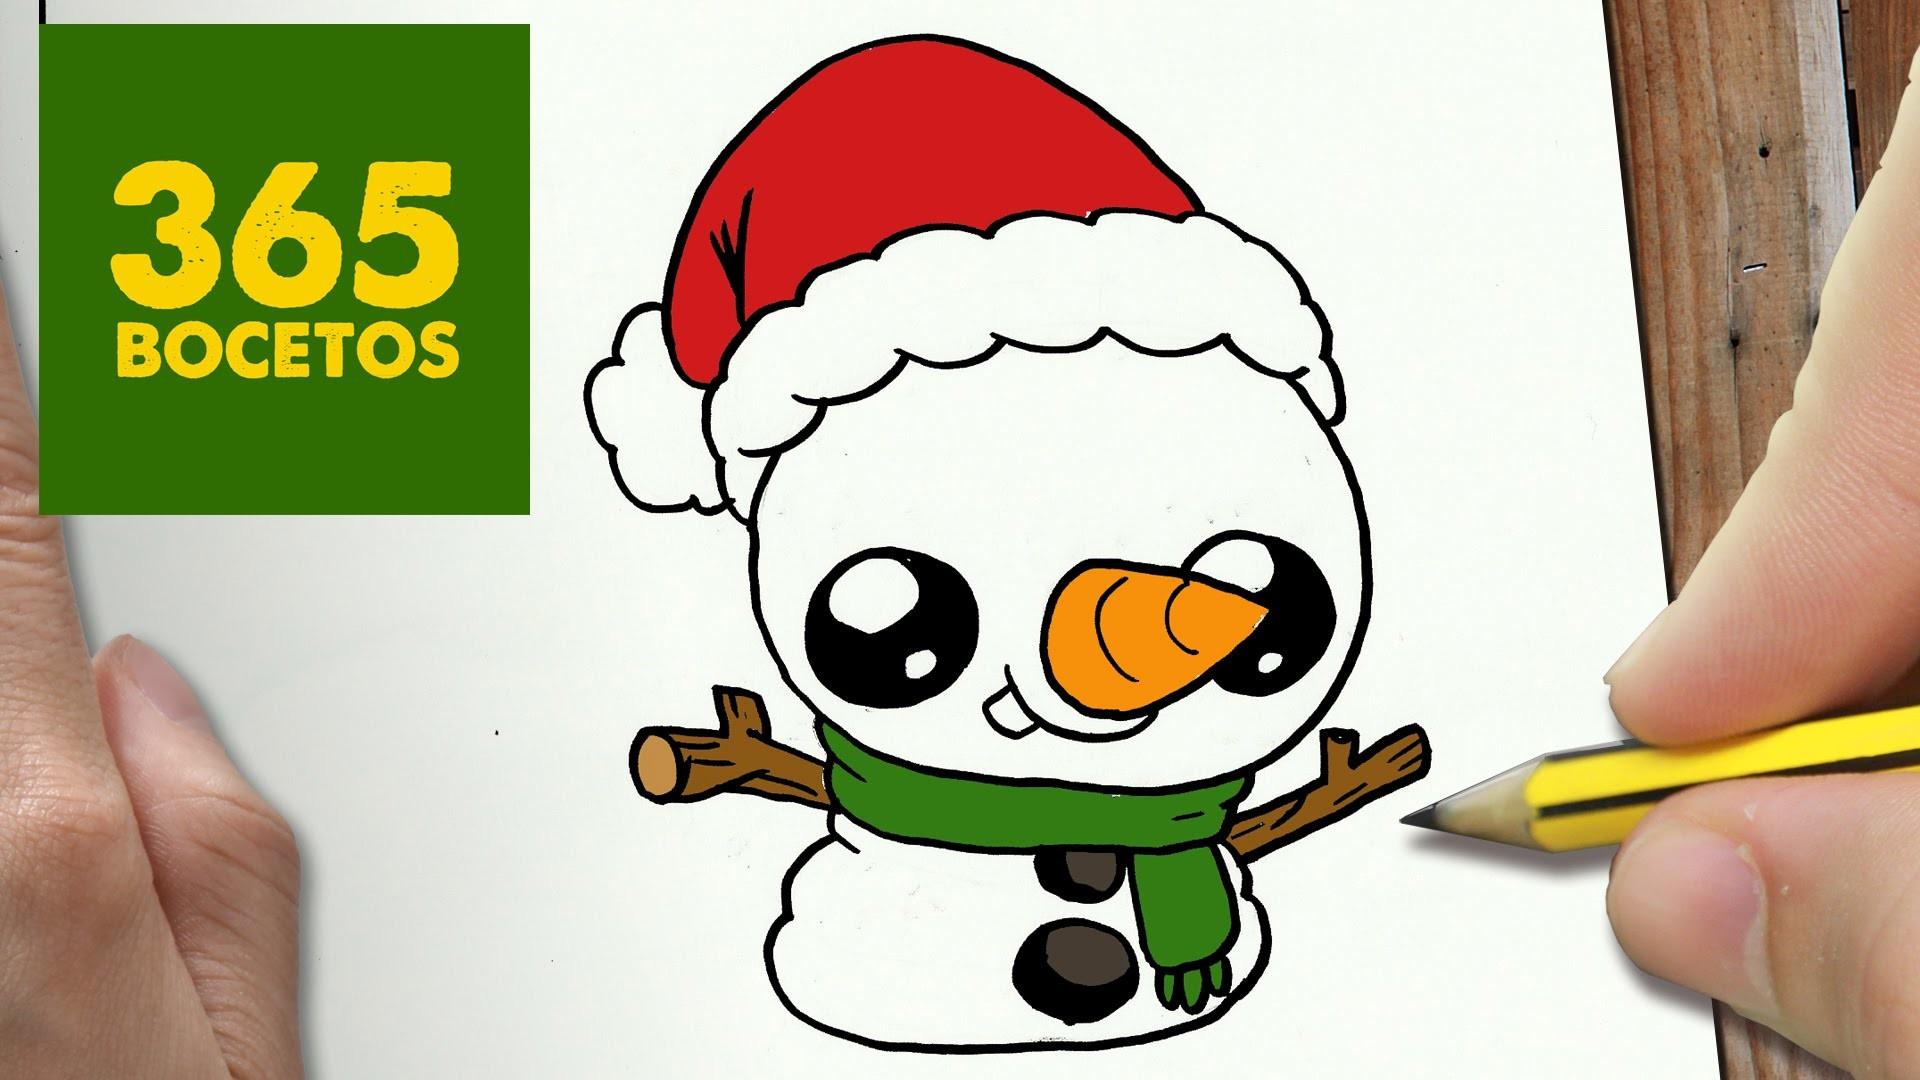 Muñeco De Nieve Dibujo: Como Dibujar Muñeco De Nieve Kawaii Paso A Paso Dibujos